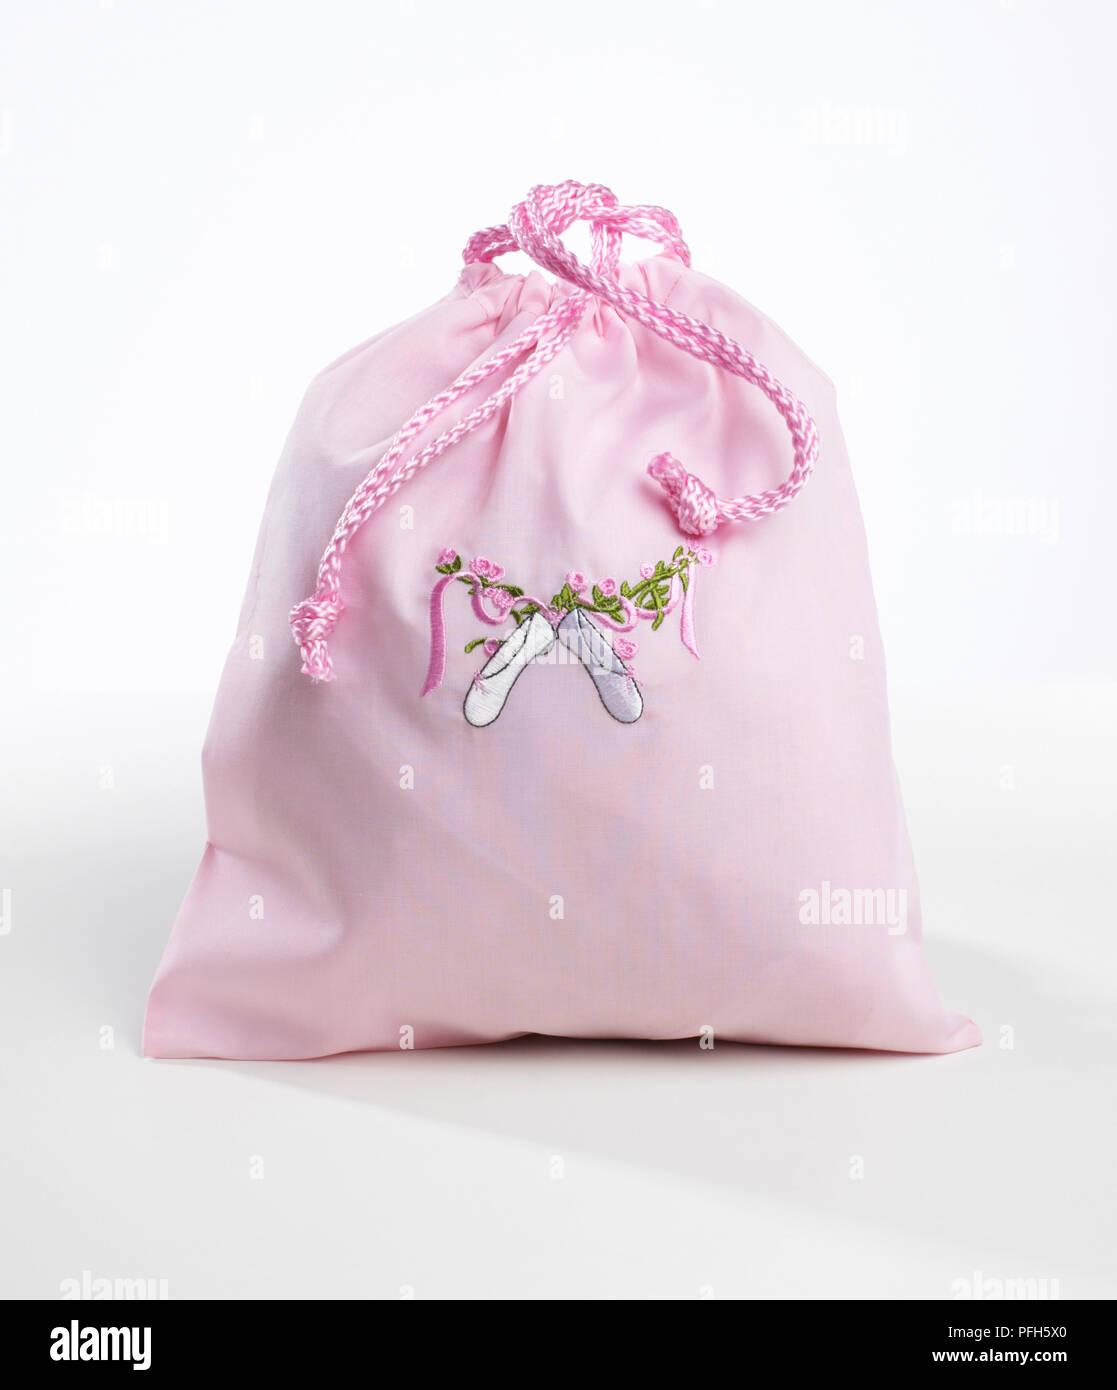 Bolsón con rosa ballet applique de zapata en la parte delantera Imagen De Stock